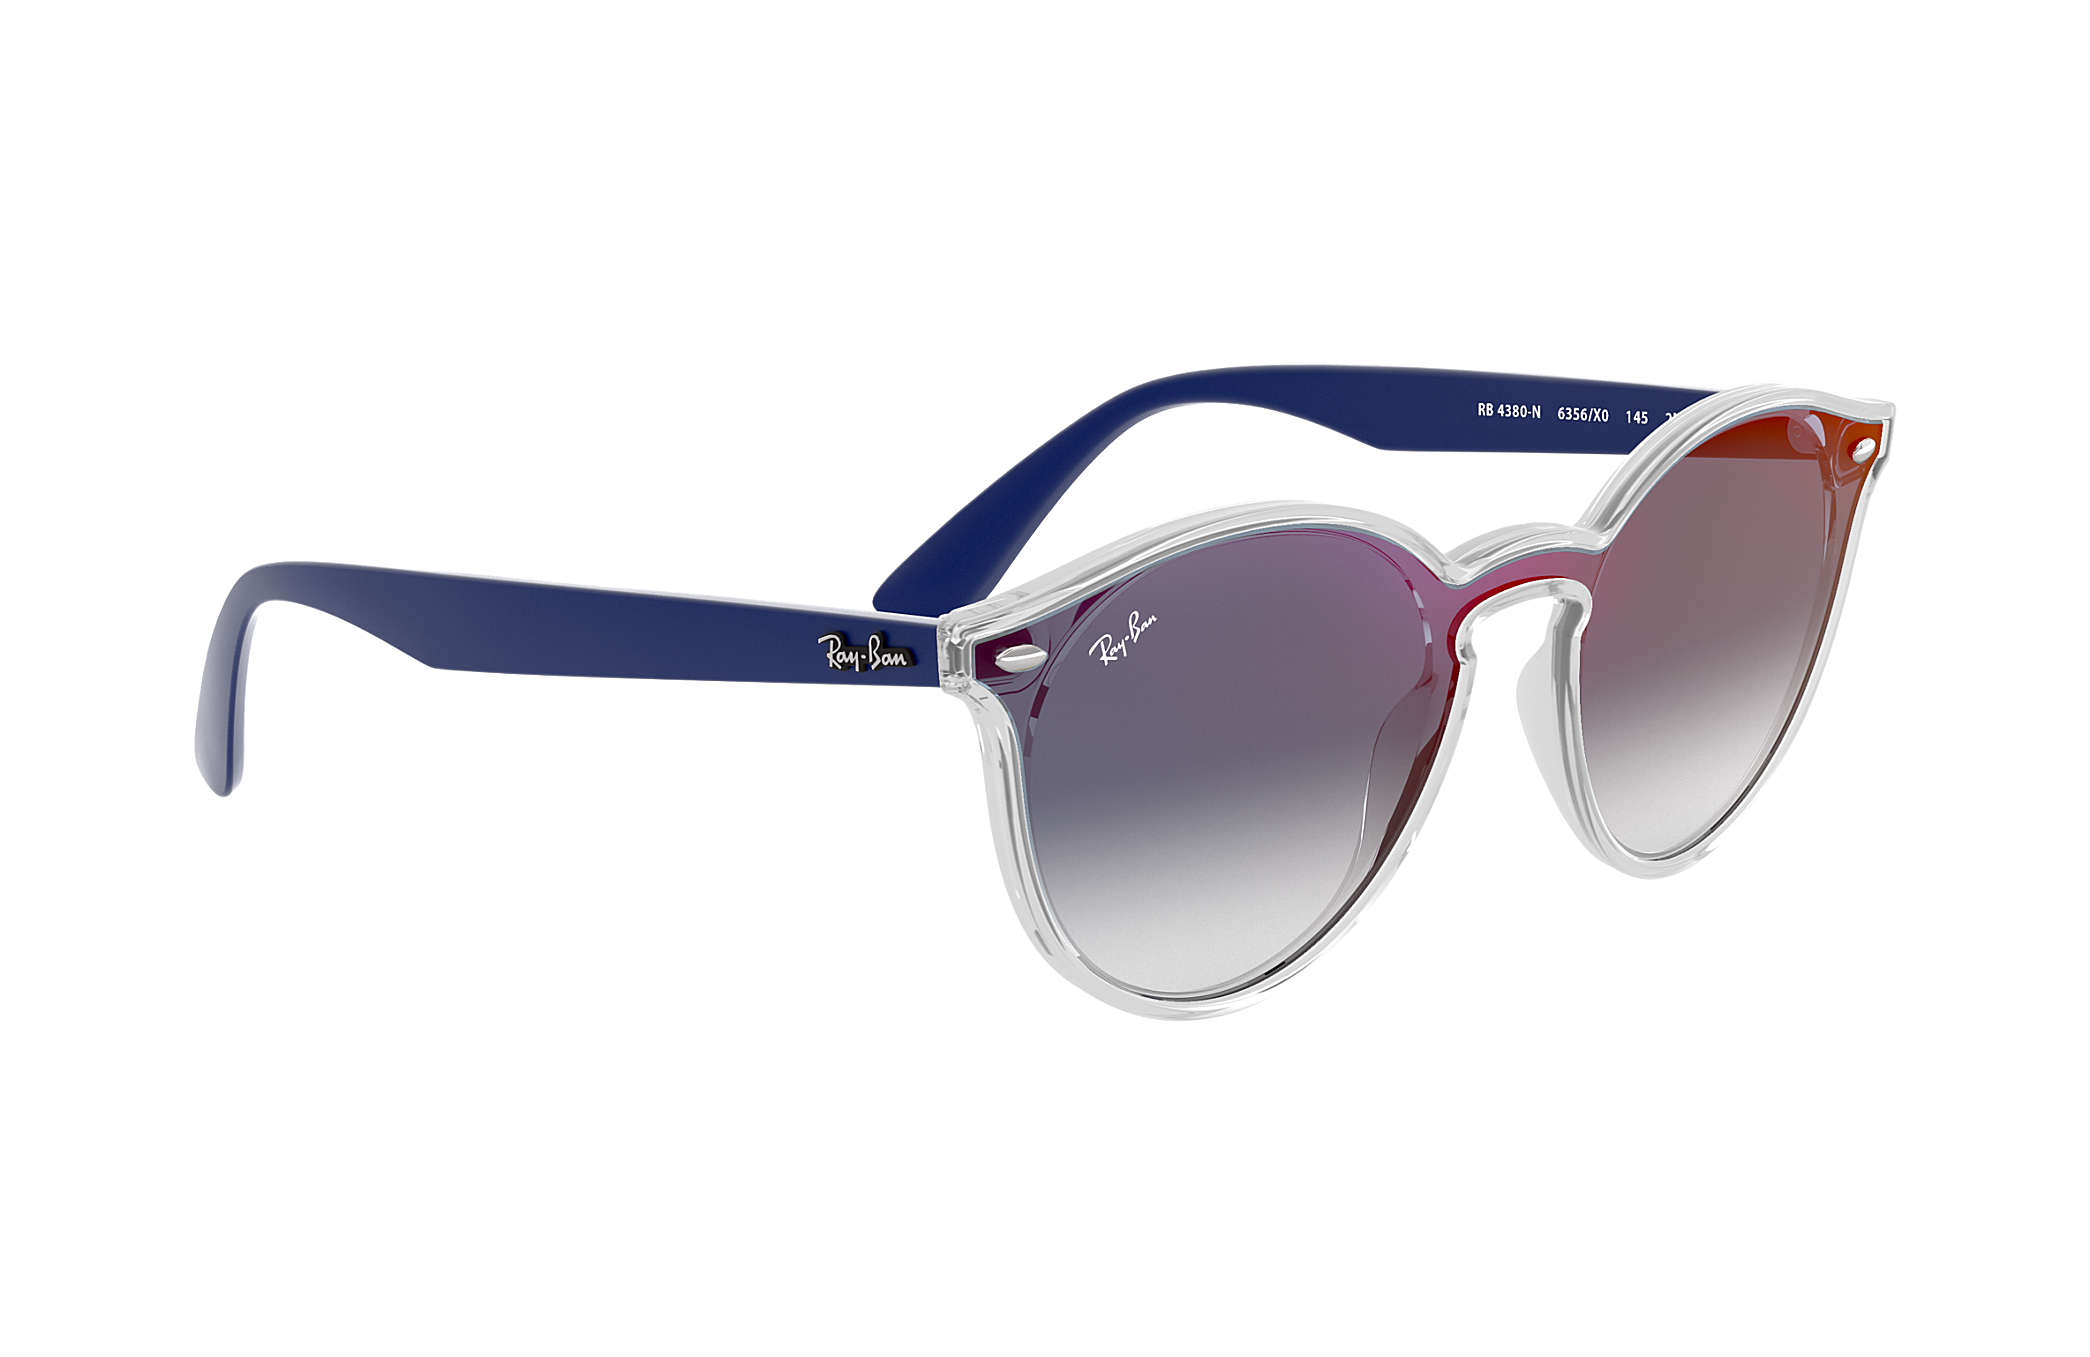 0b33a06f899de Ray-Ban Blaze Rb4380n RB4380N Transparente - Nylon - Lentes Azul ...